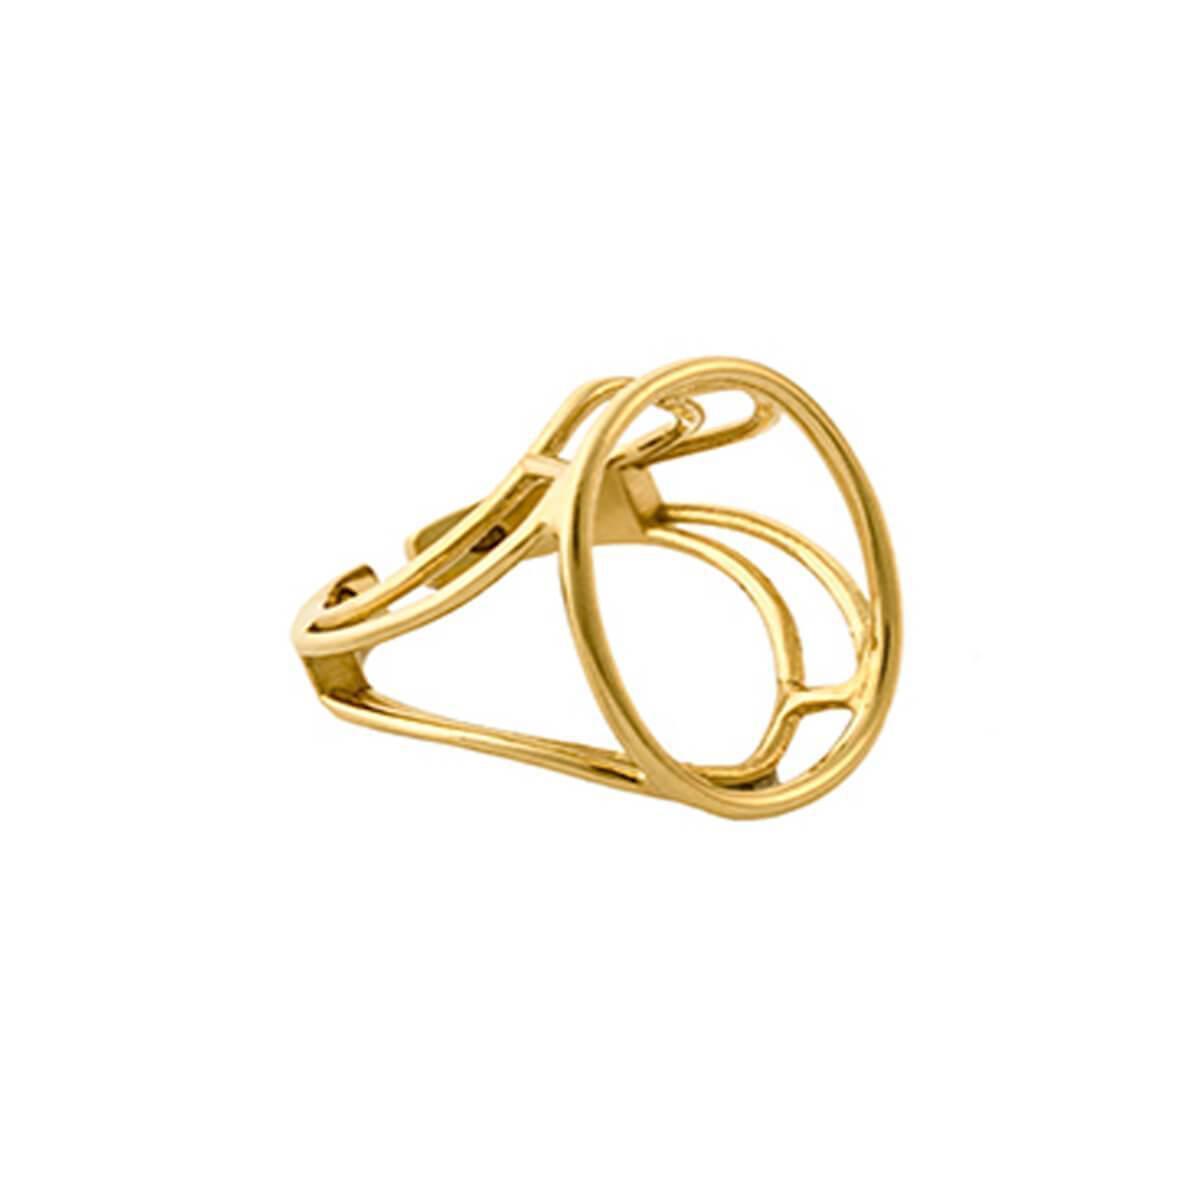 Glenda Lopez 18kt Gold Dipped Empty Signet Ring - UK N - US 6 1/2 - EU 54 S5H8kay